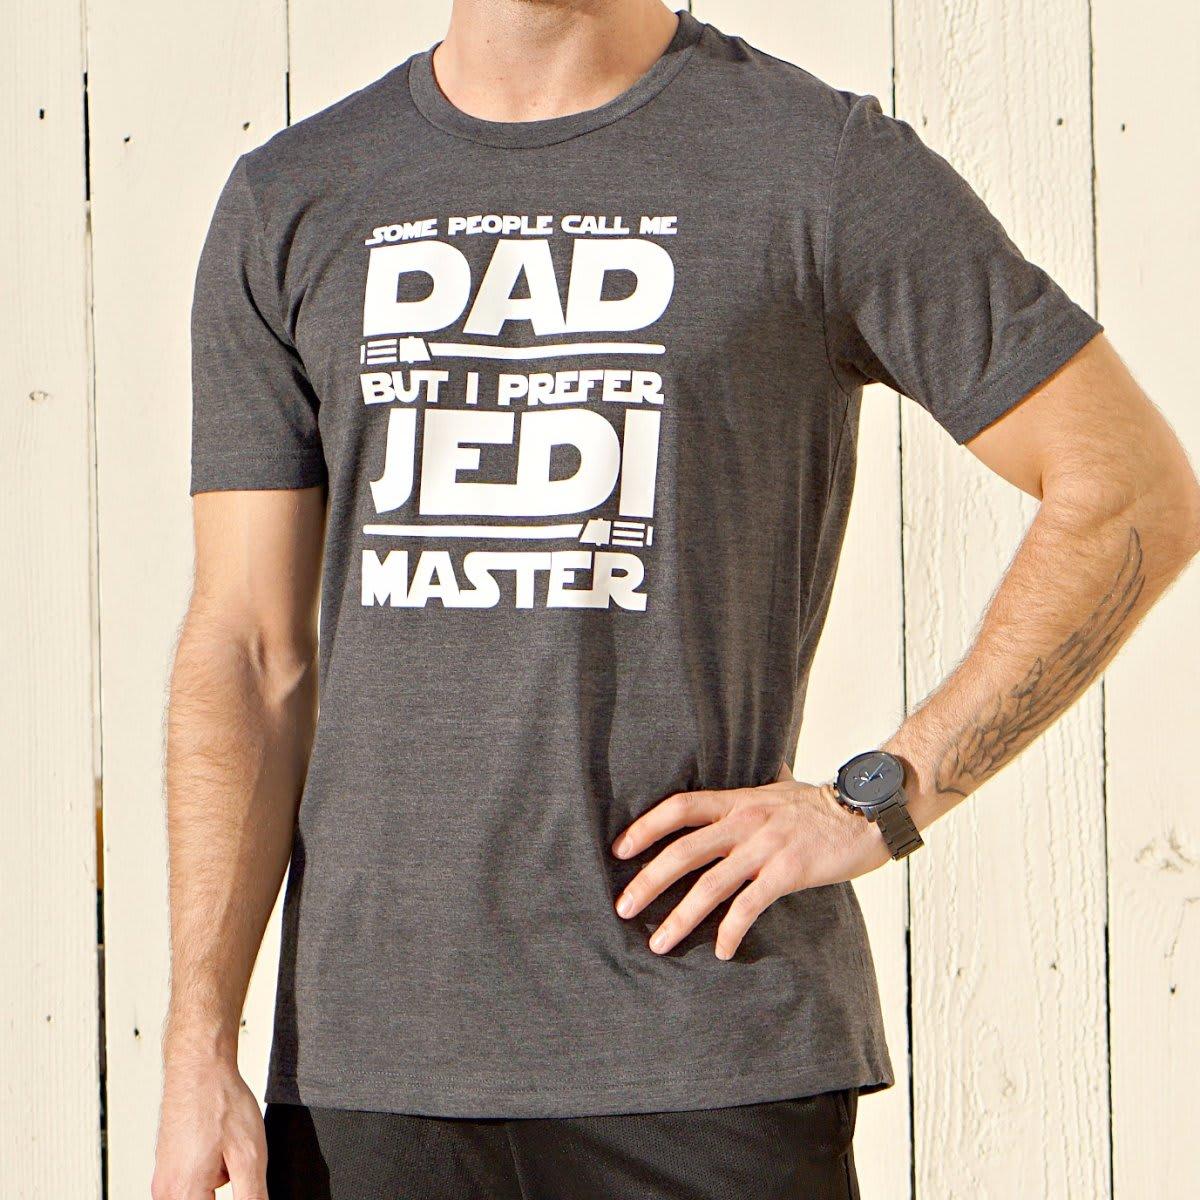 Best Dad Shirts Free Shipping Jane Jacie Shirt 35you Save